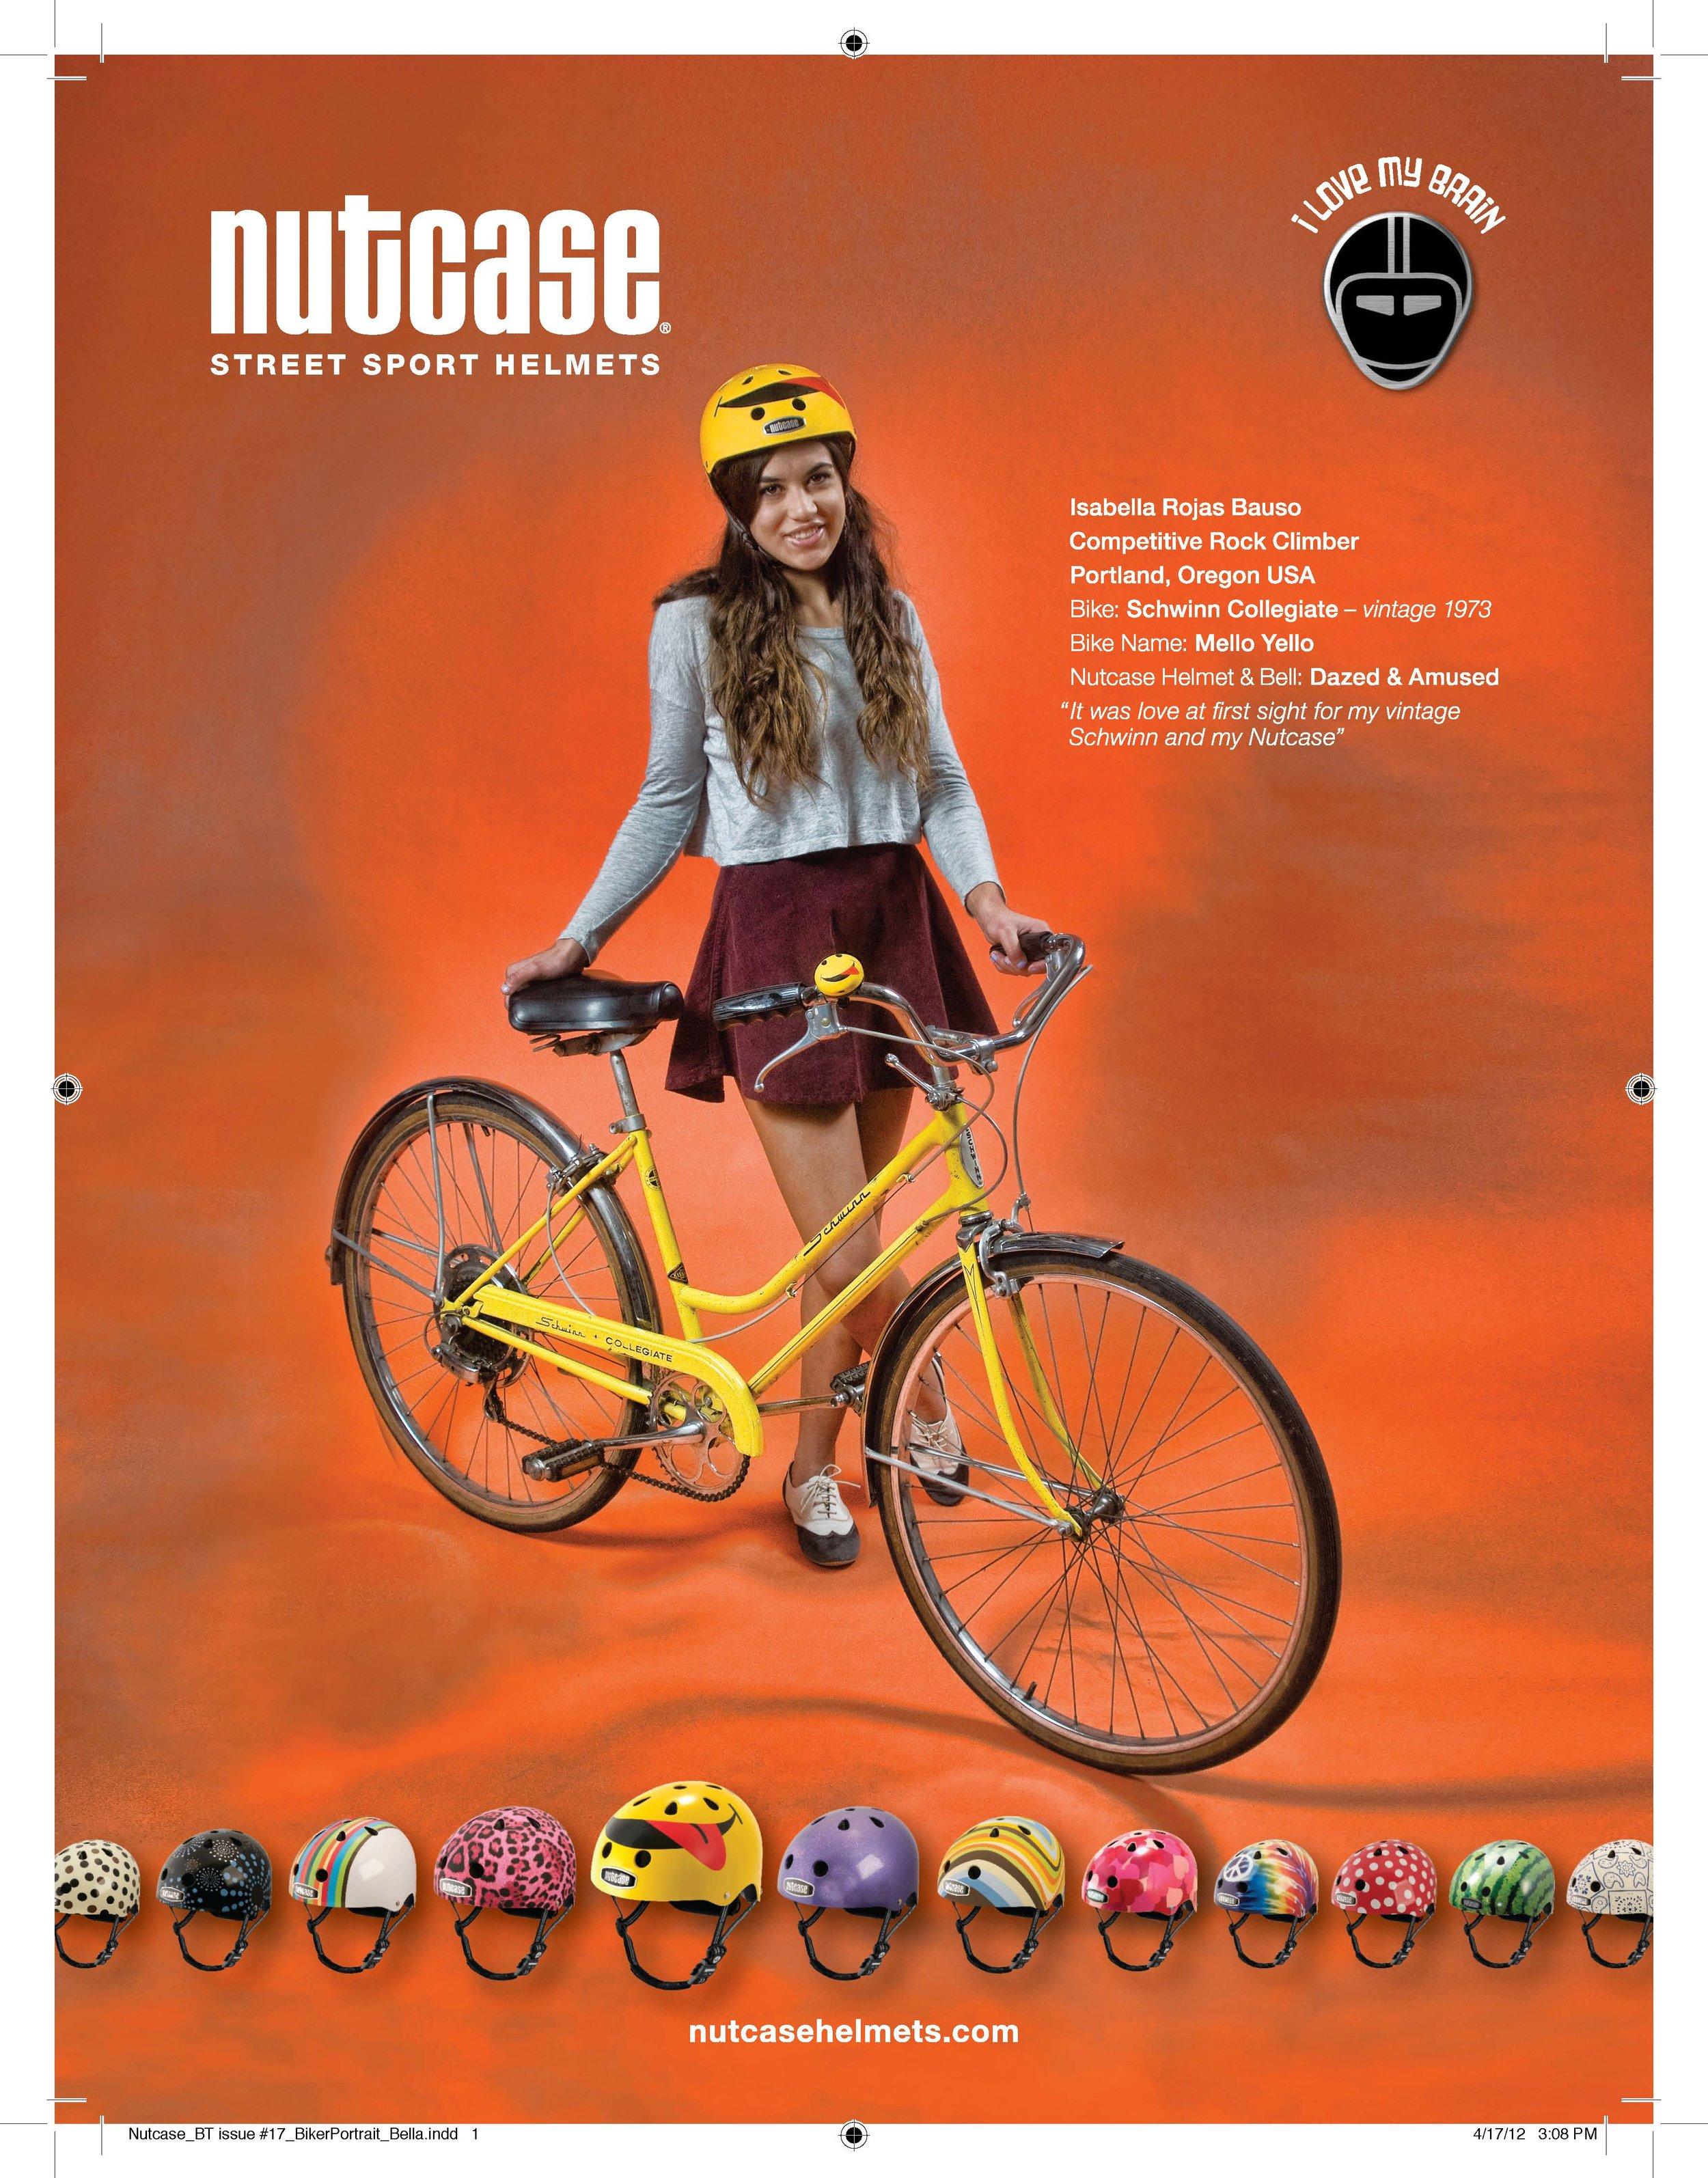 Nutcase_BT issue #17_BikerPortrait_Bella_hi.jpg